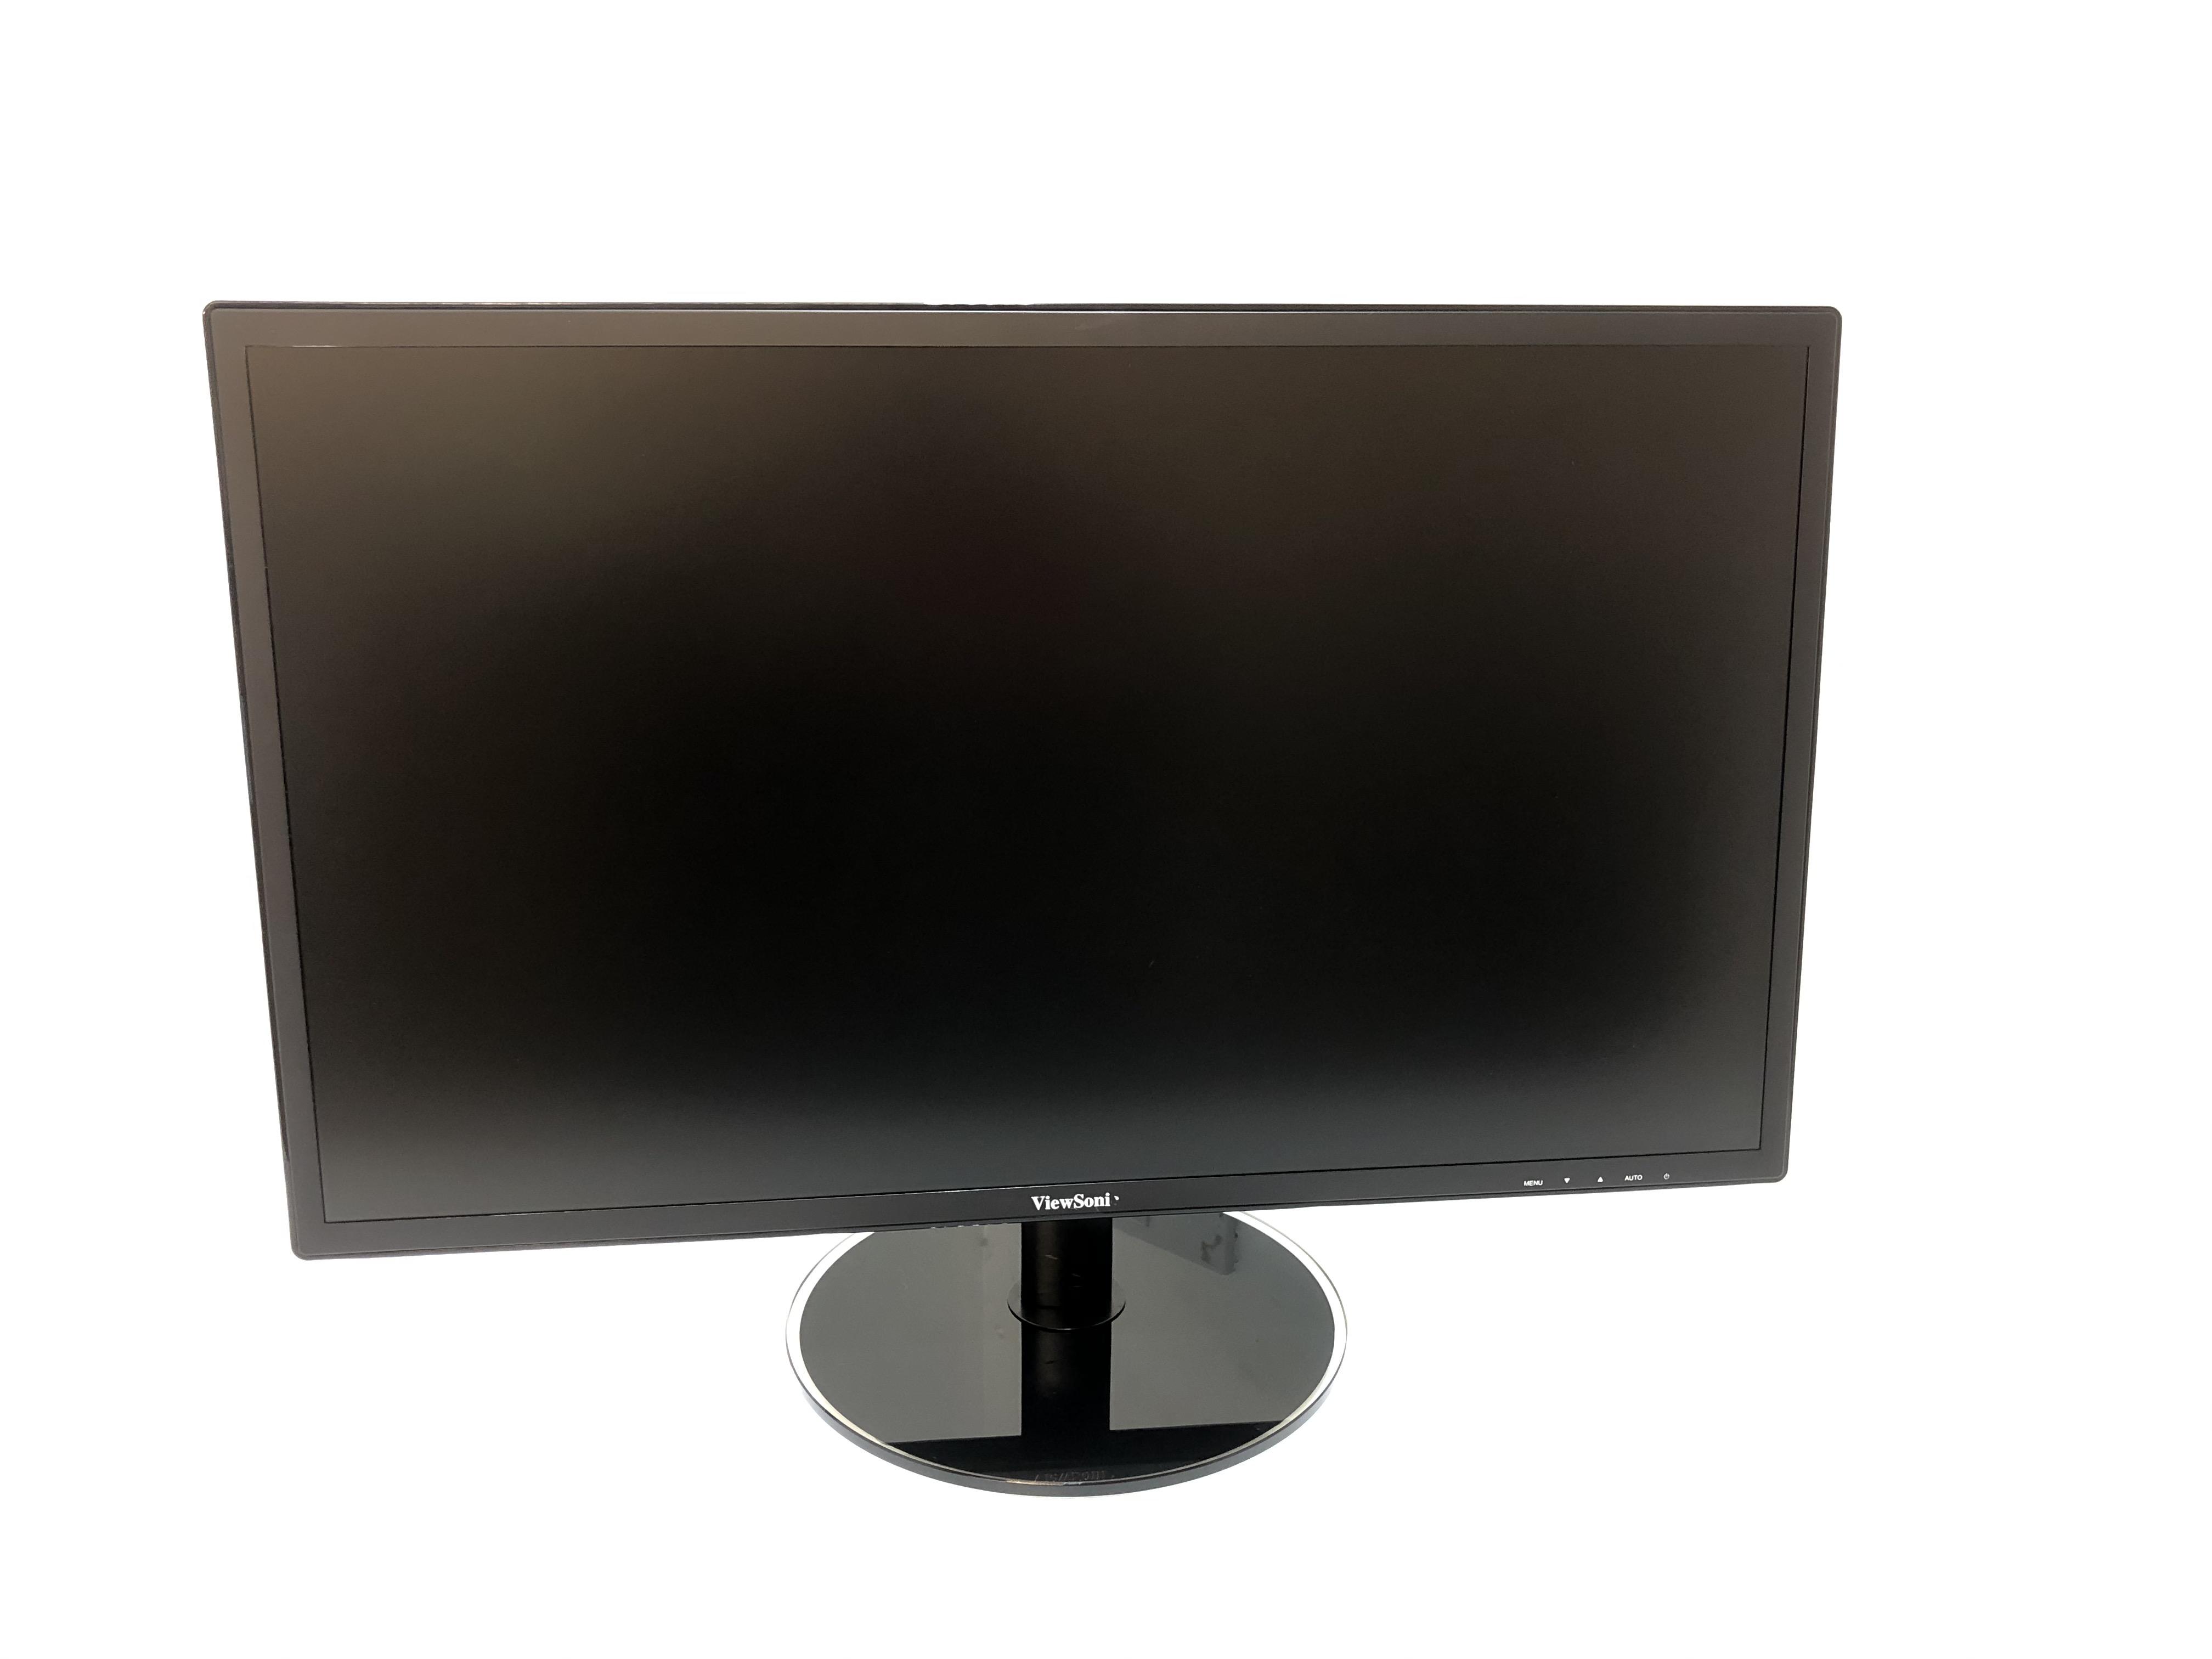 Viewsonic-VX2409 - 148431